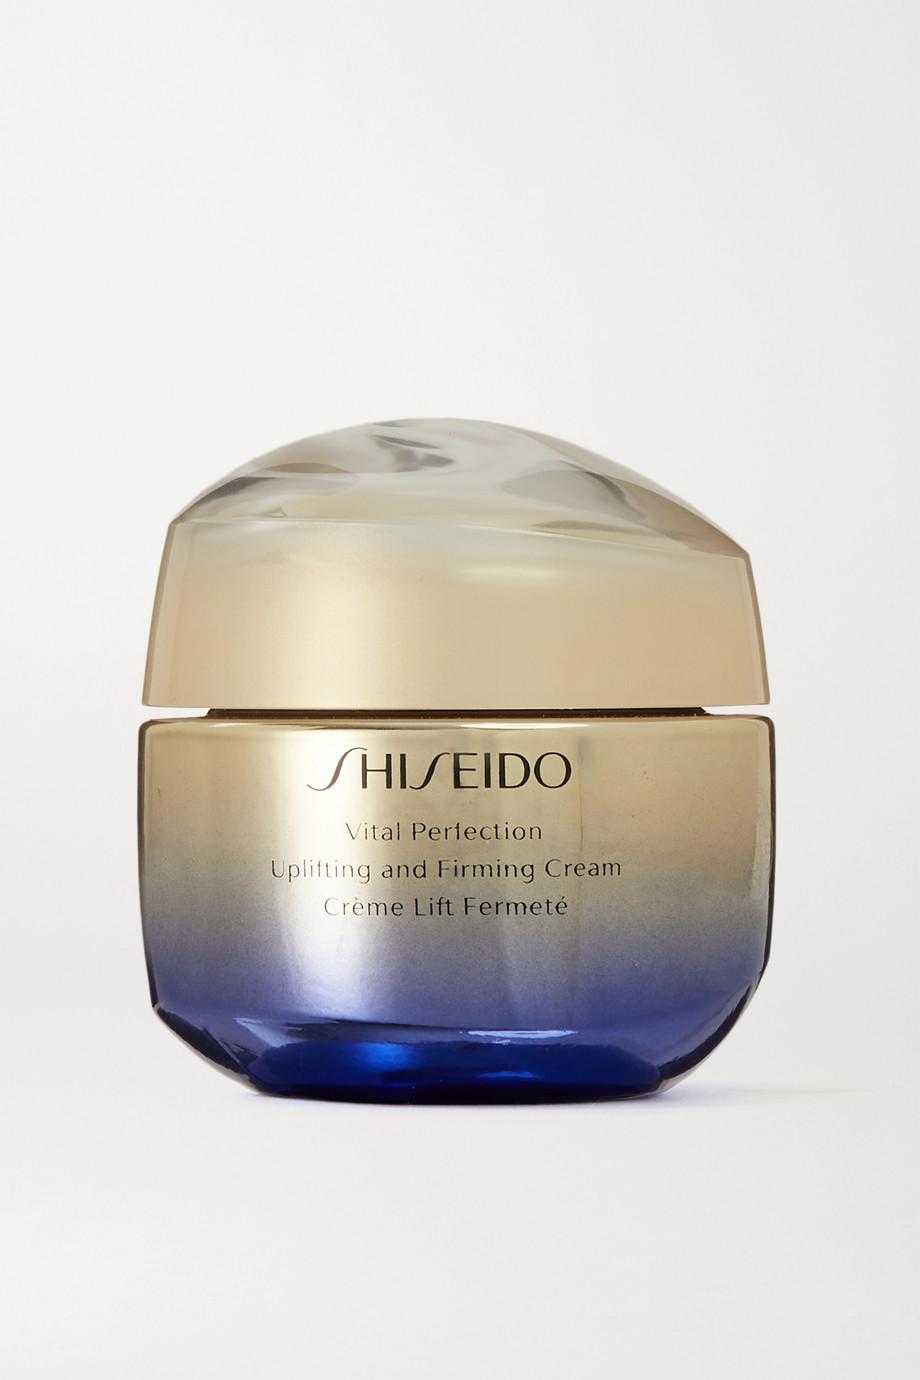 Shiseido Crème lift fermeté Vital Perfection, 50 ml